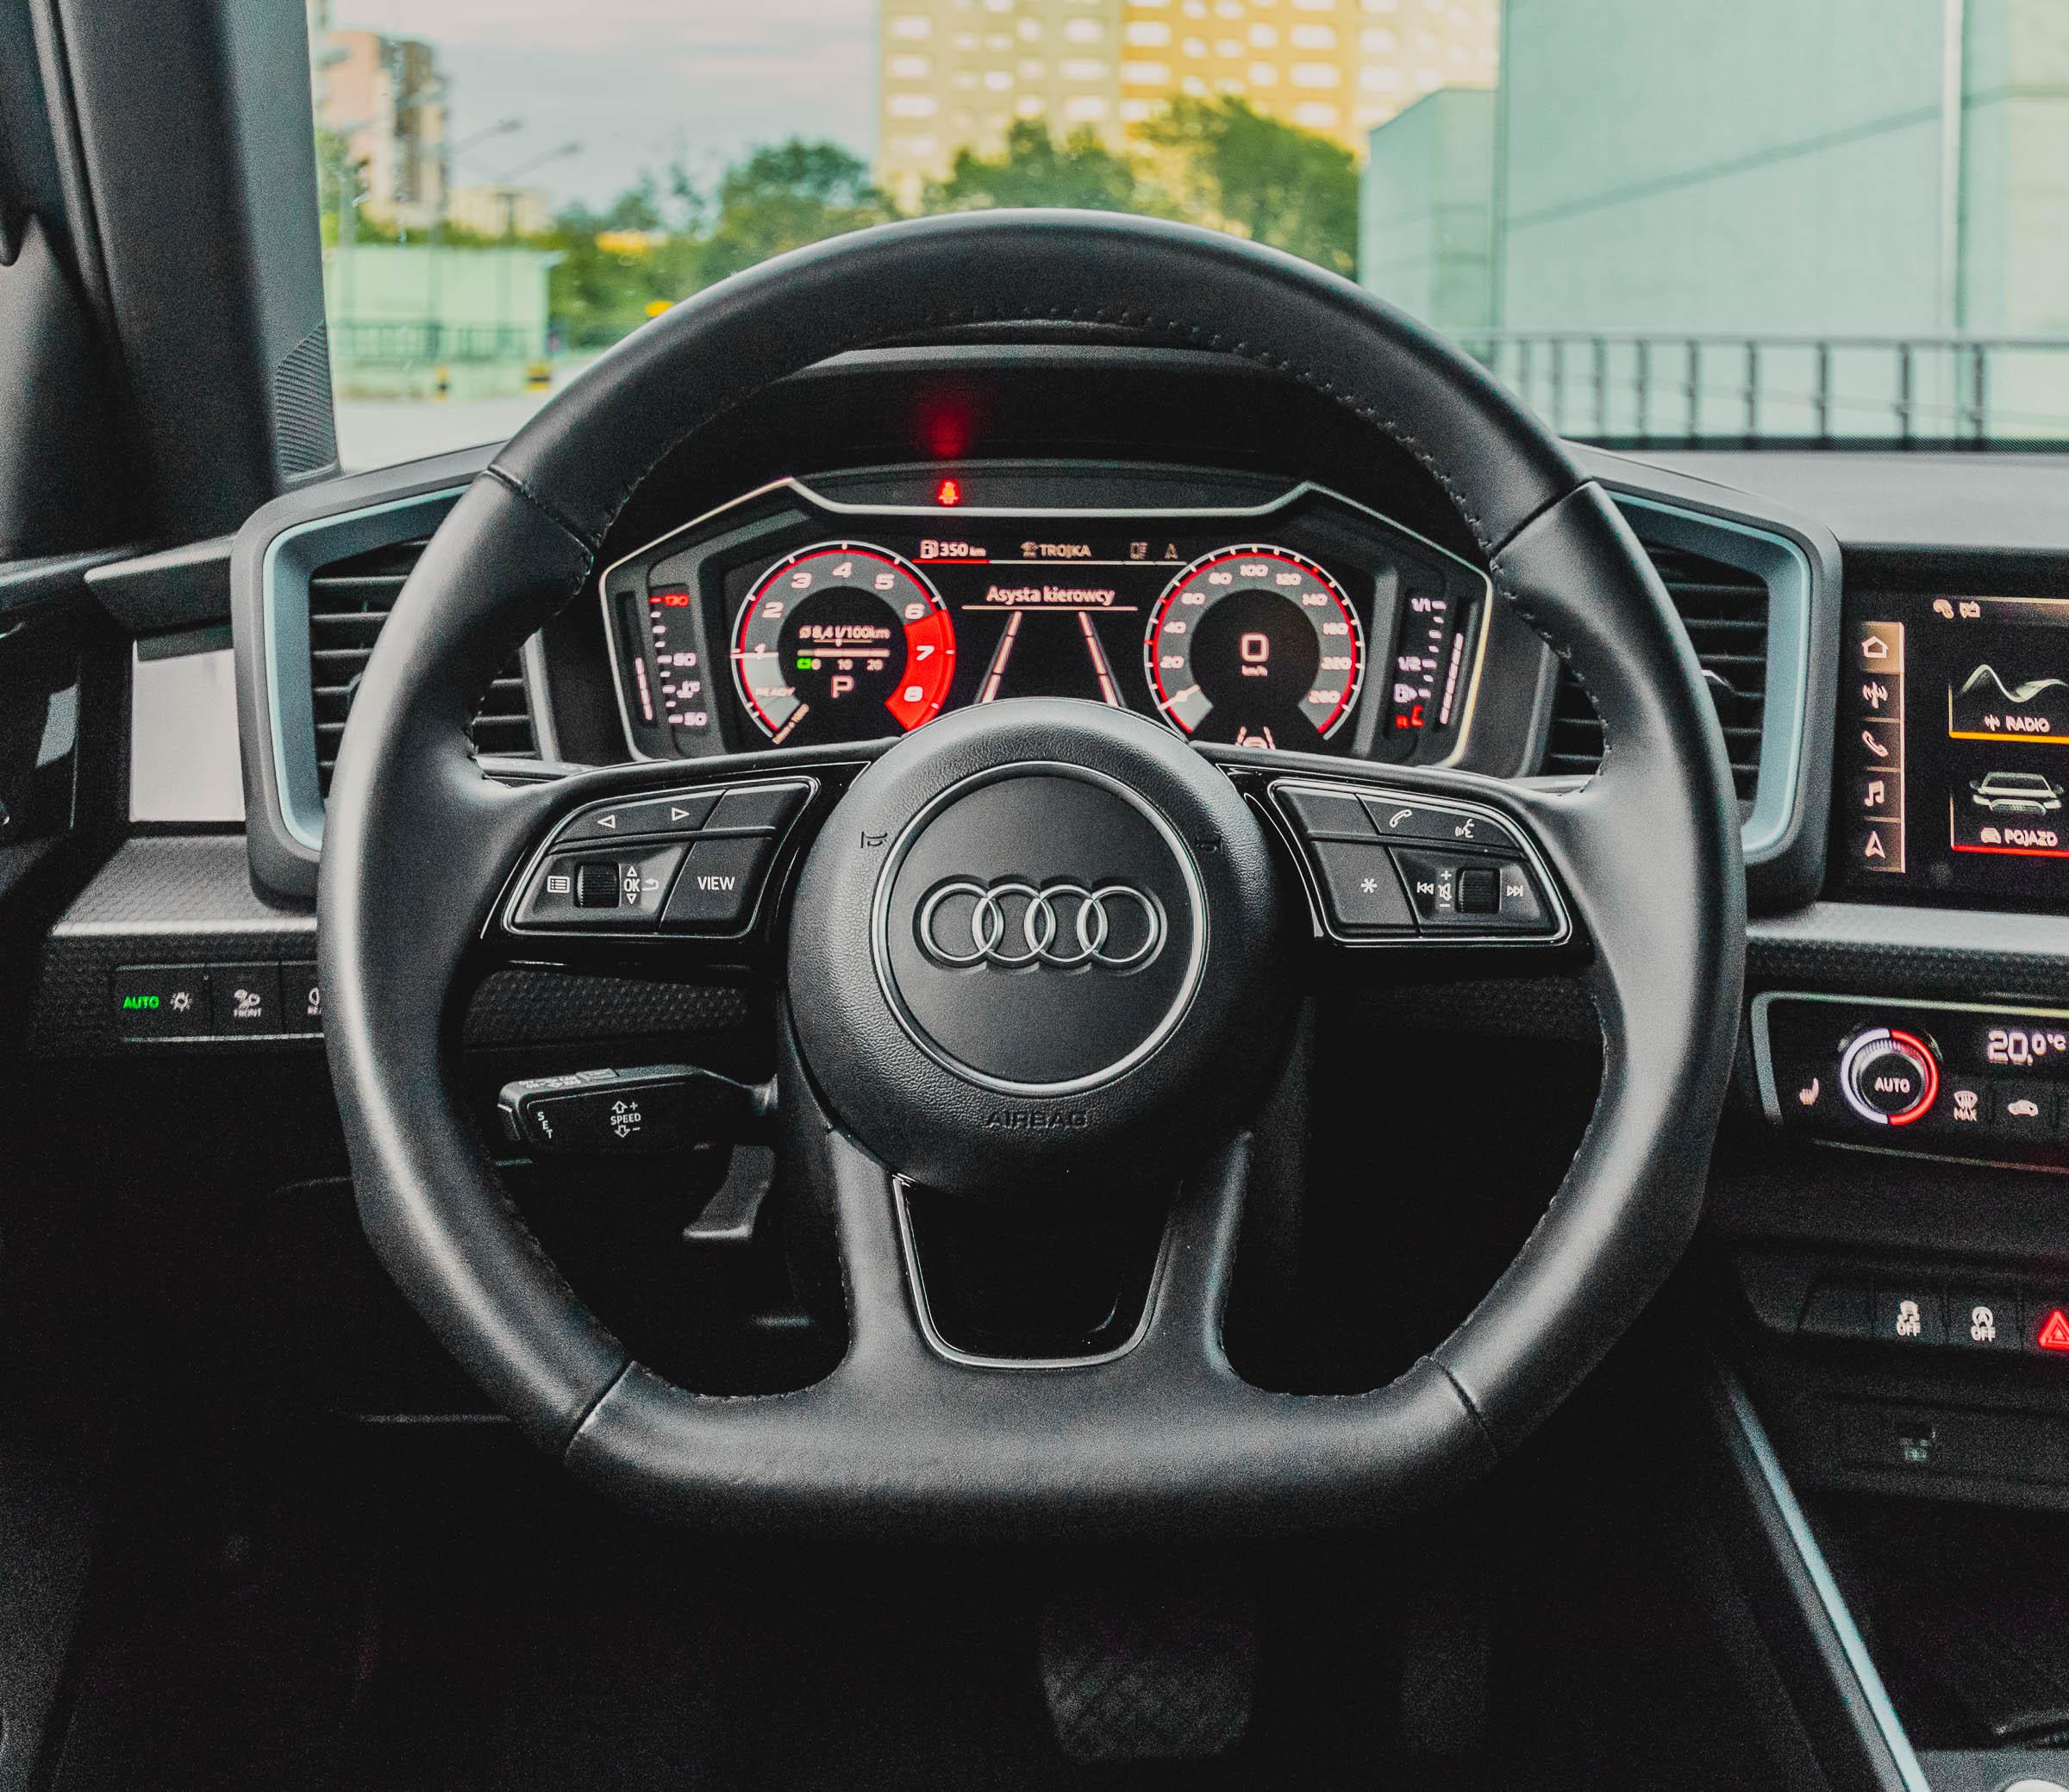 Audi A1 1.5 TFSI 2019 test